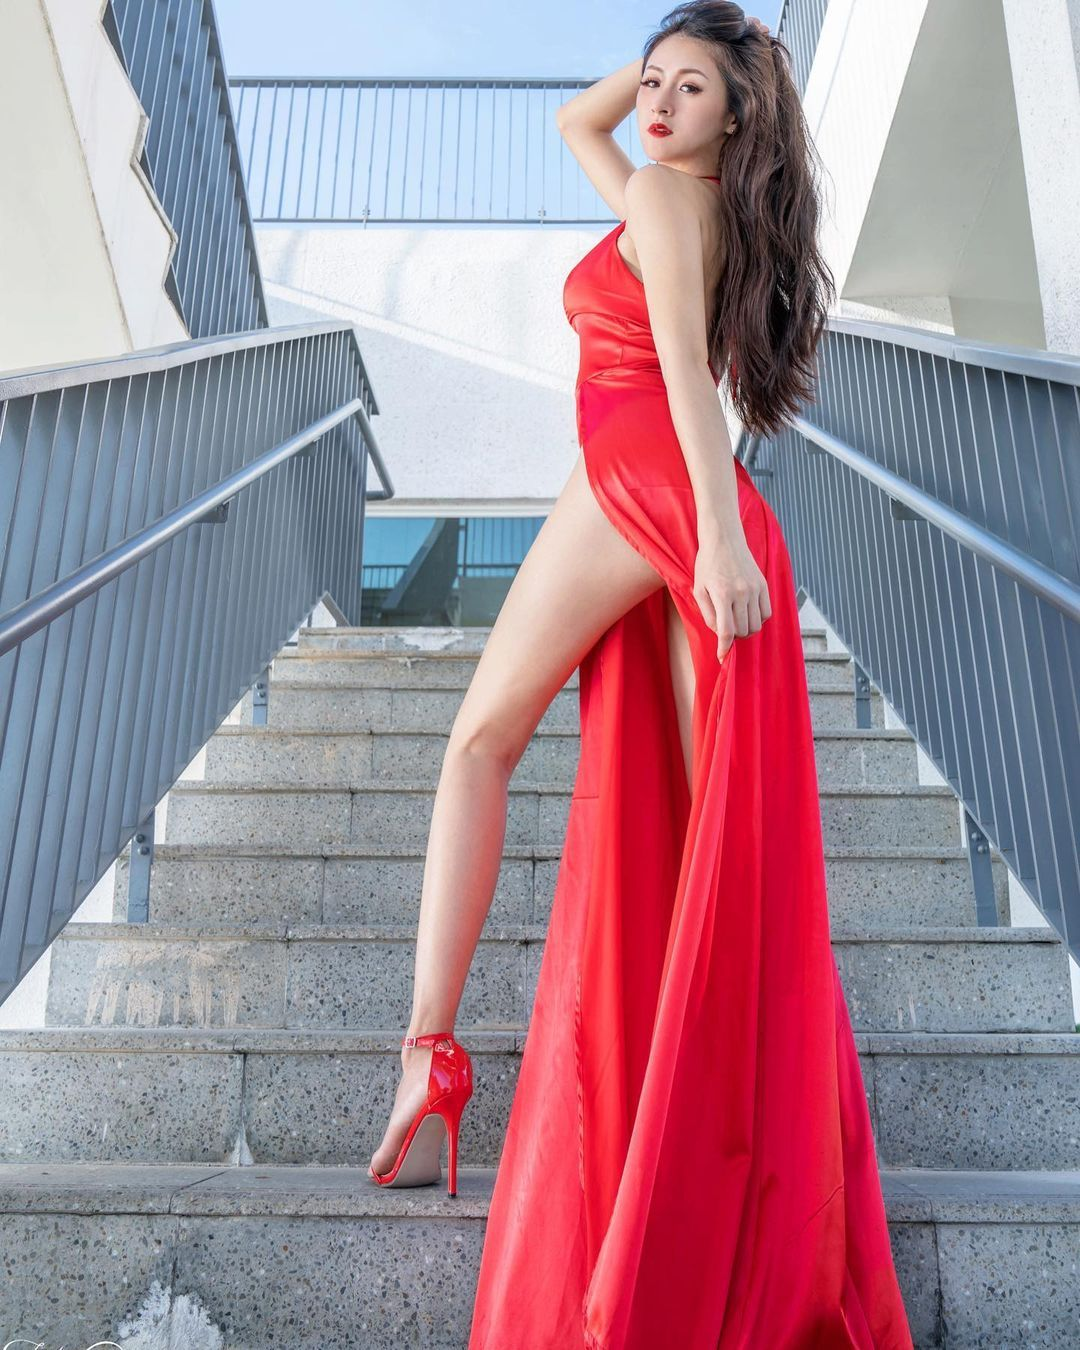 175cm幼教老师兼腿模Lola 雪岑 拥有一双逆天长腿 发现美